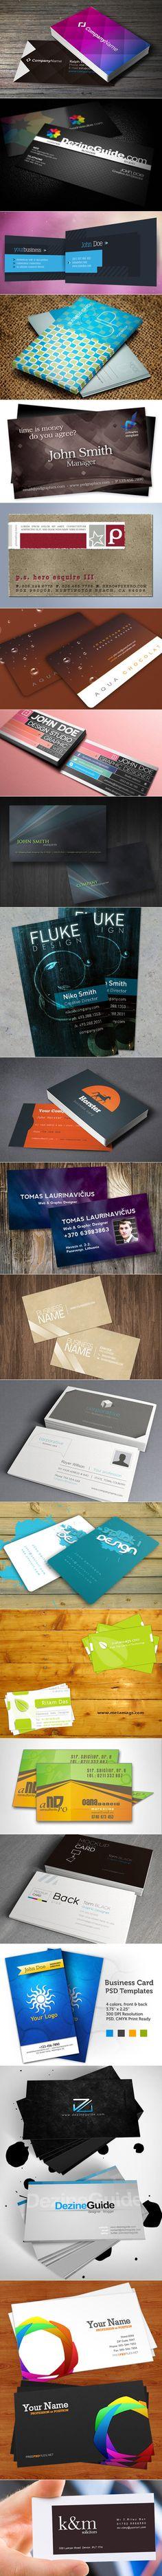 Business Card PSD Templates - #psd #photoshop #templates #design #freebies #resources - www.boostinspiration.com/resources/20-free-photoshop-business-card-templates/